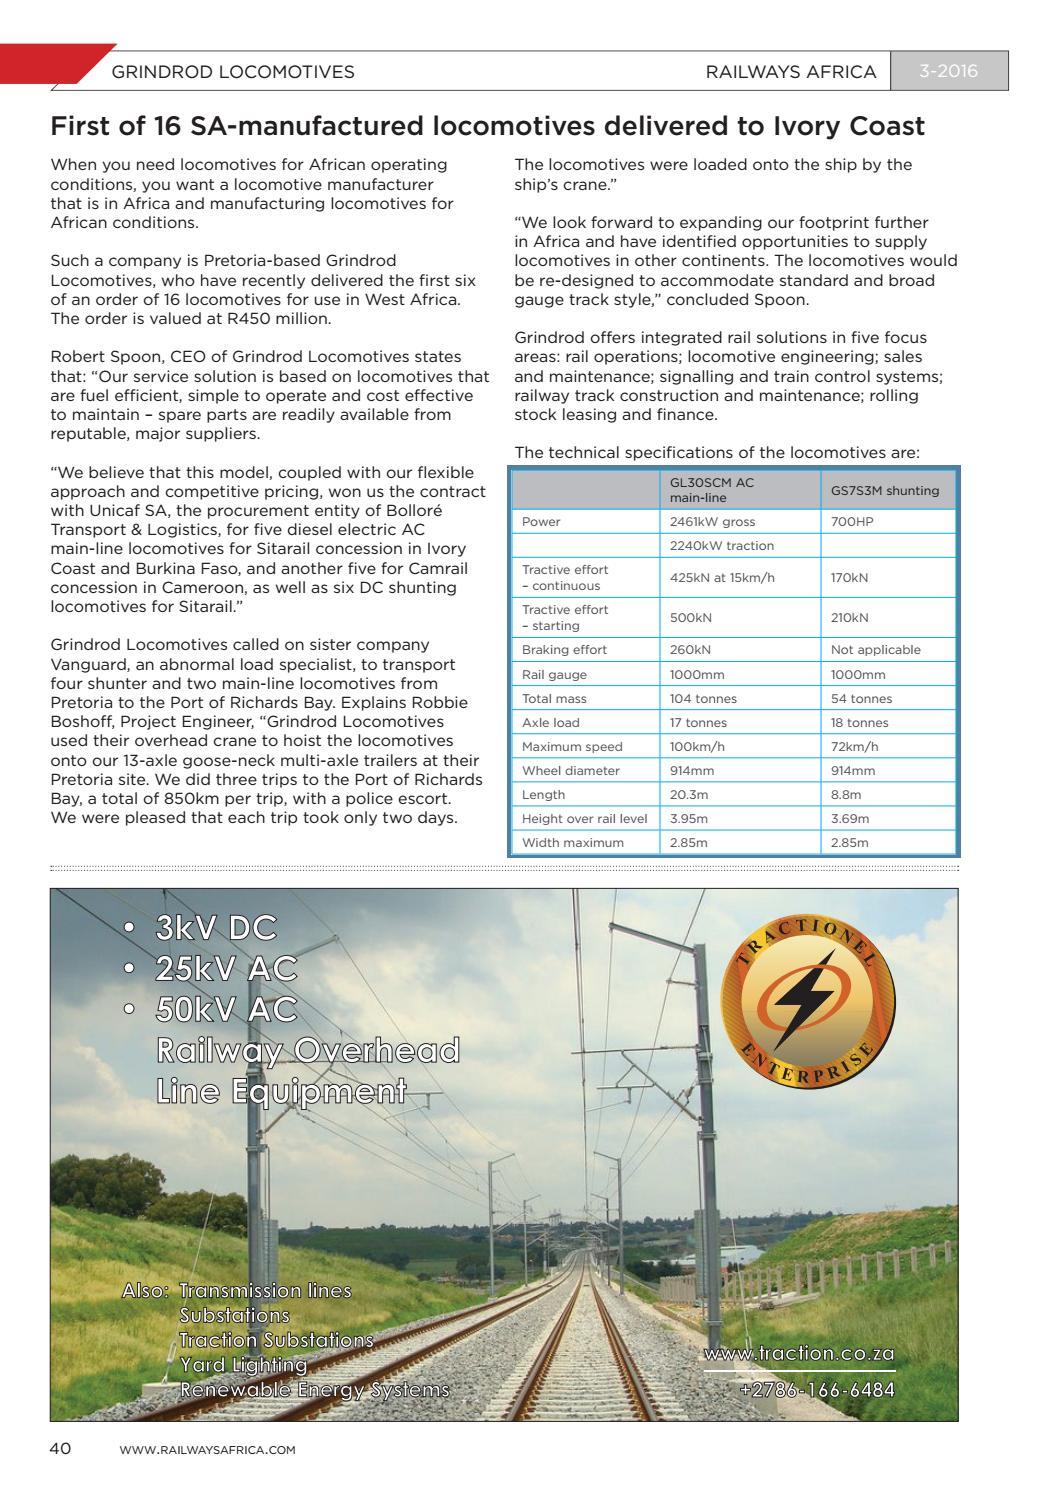 Railways Africa: Issue 3 - 2016 by Railways Africa - issuu